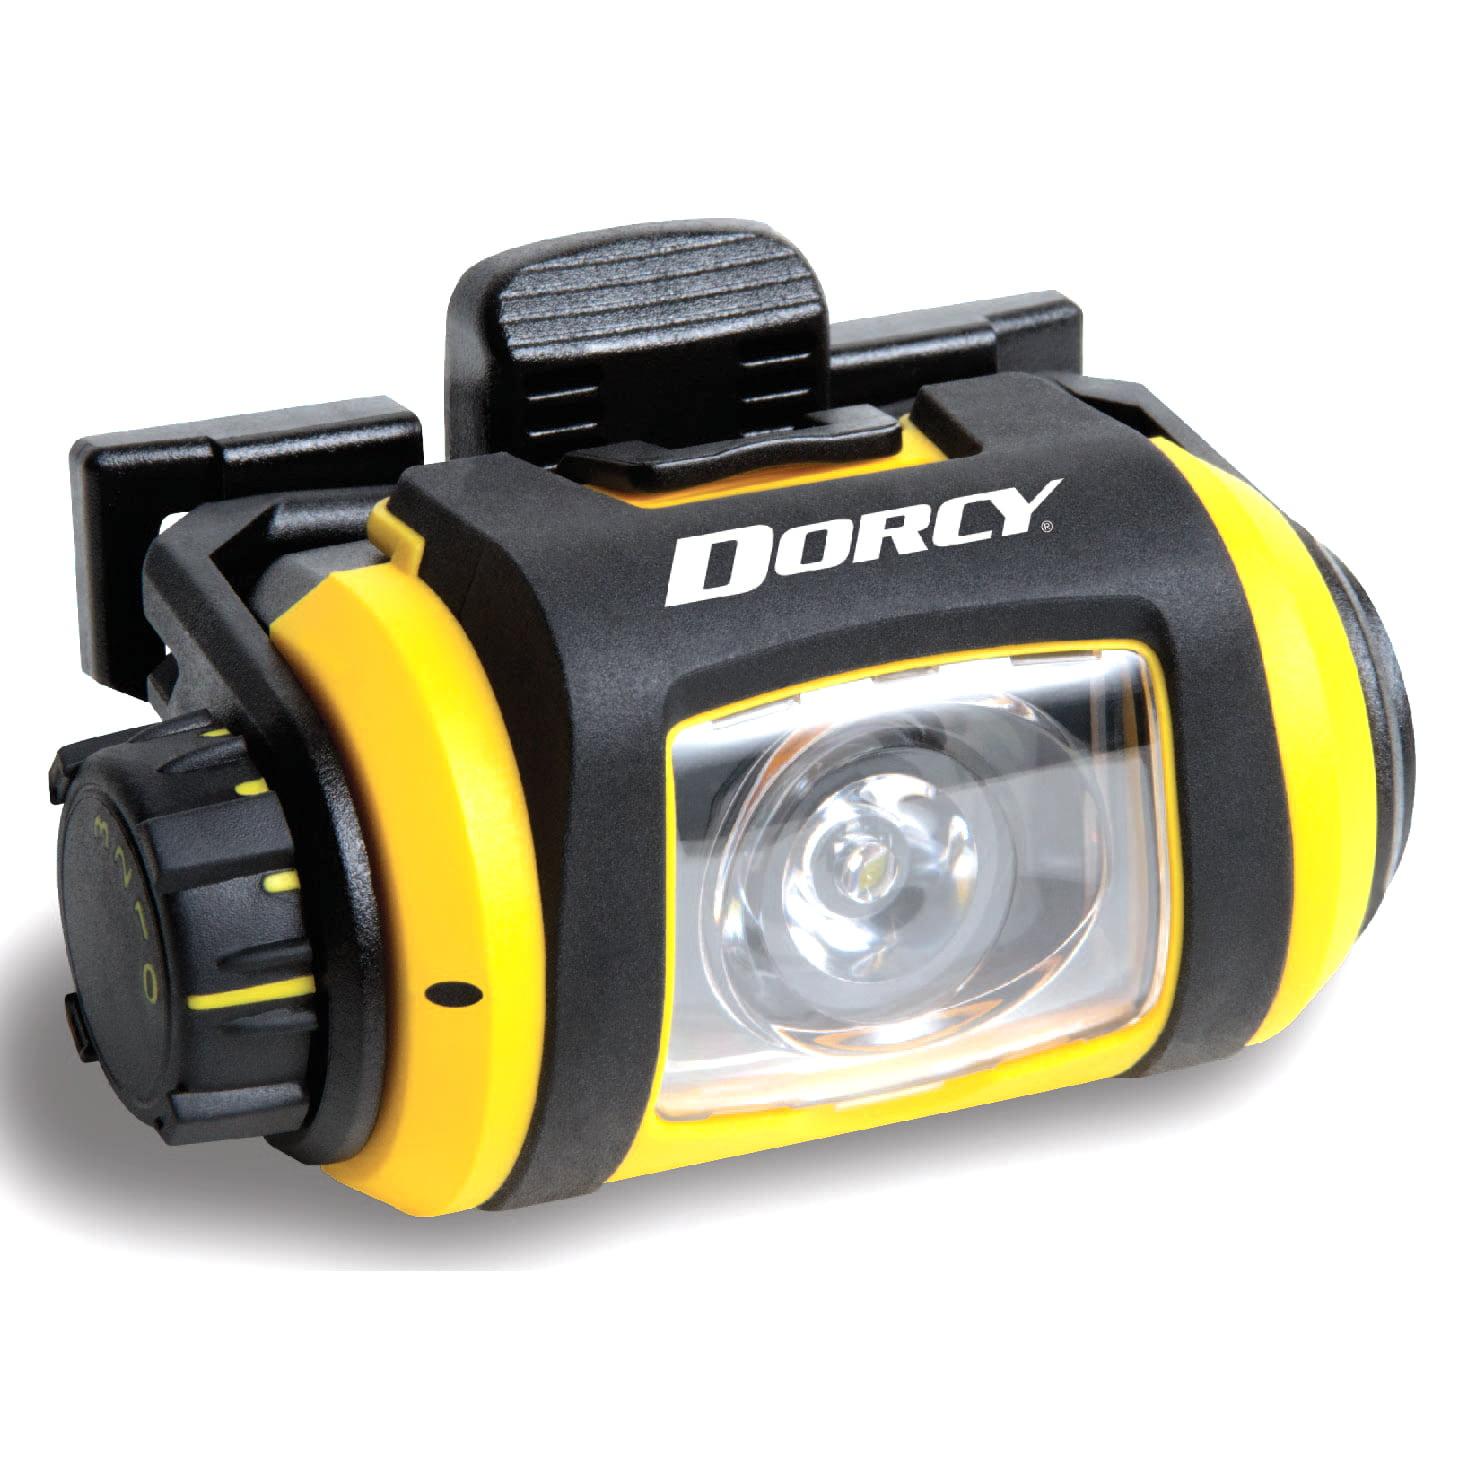 Dorcy 41-2612 200 Lumen LED Pro Series Headlight